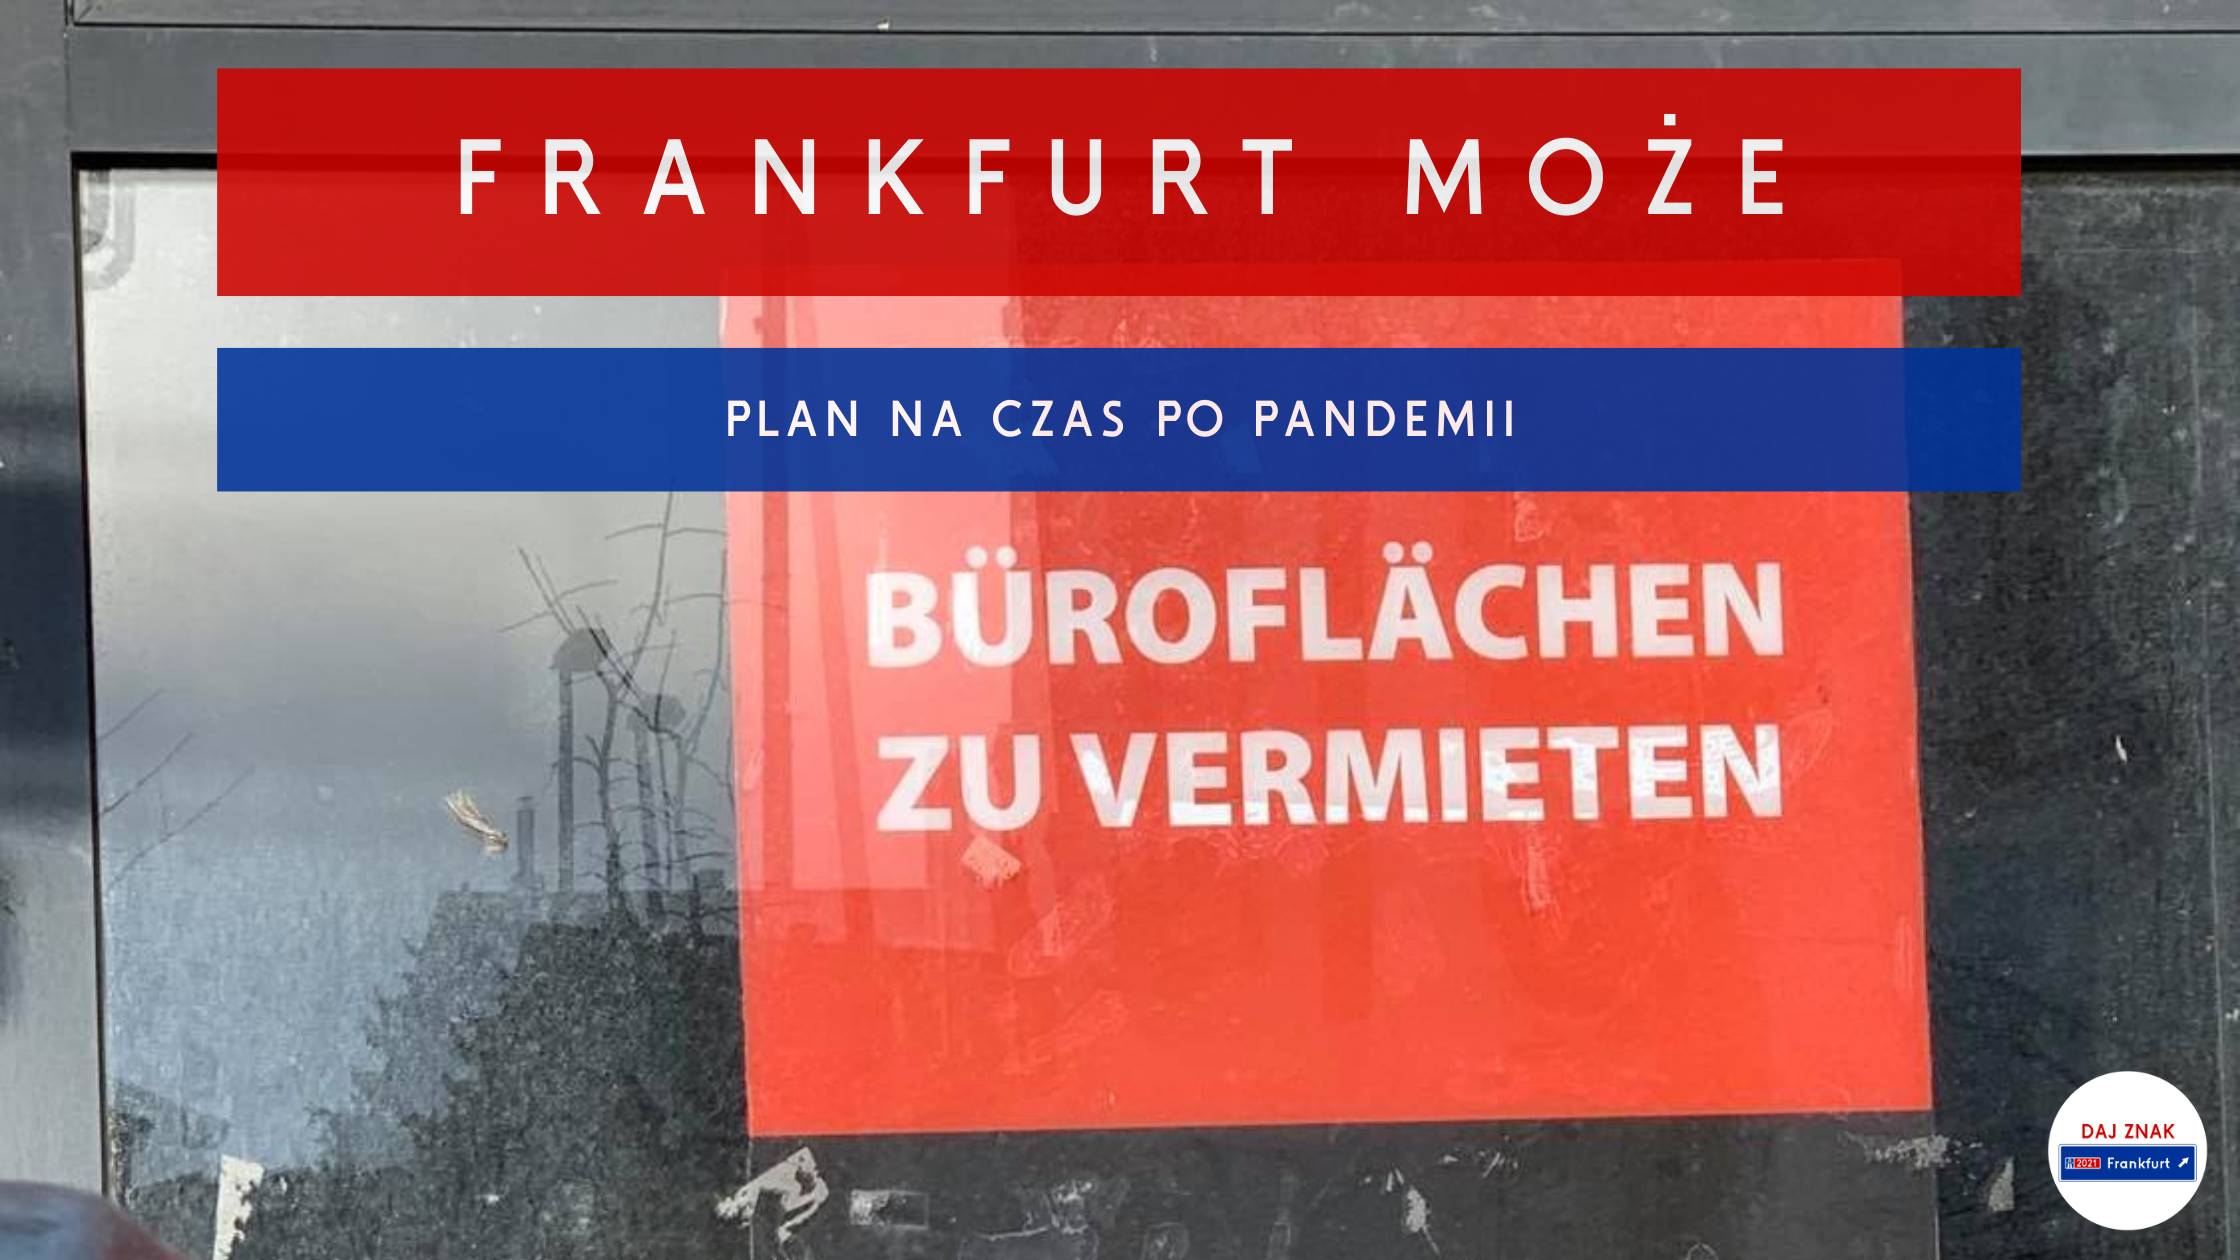 Frankfurt moze_Plan na czas po pandemii